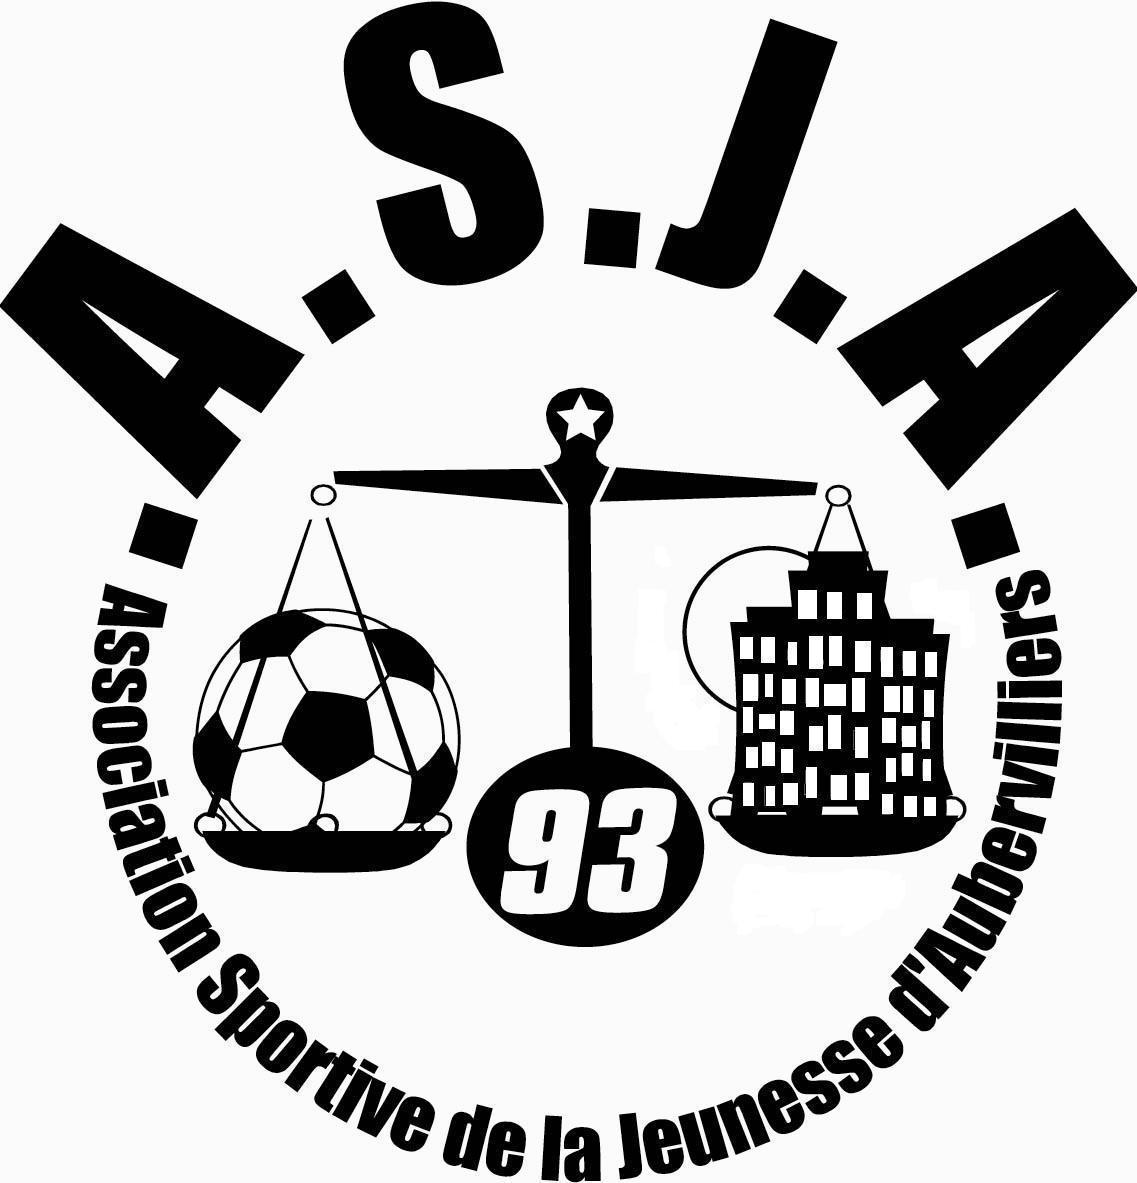 http://old.staff.footeo.com/uploads/as-jeunesseaubervilliers/Medias/Logo_FOOTBALL_pour_le_Papier_a_entete.JPG